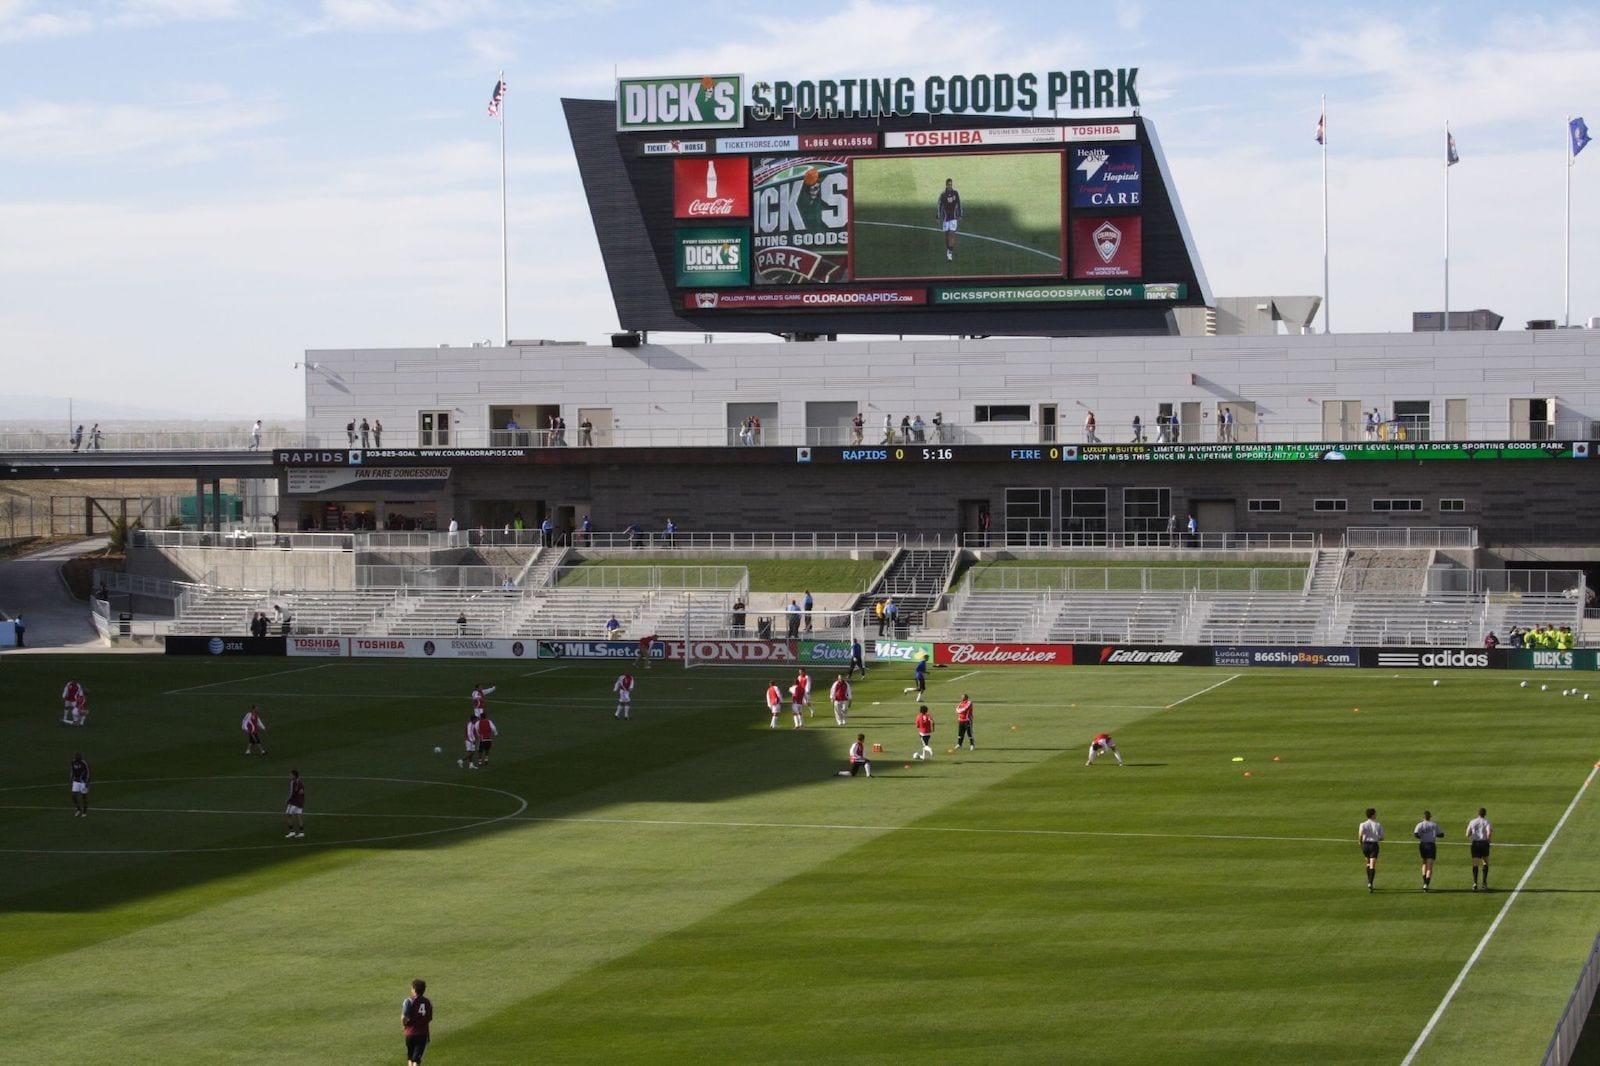 Dick's Sporting Goods Park Soccer Field